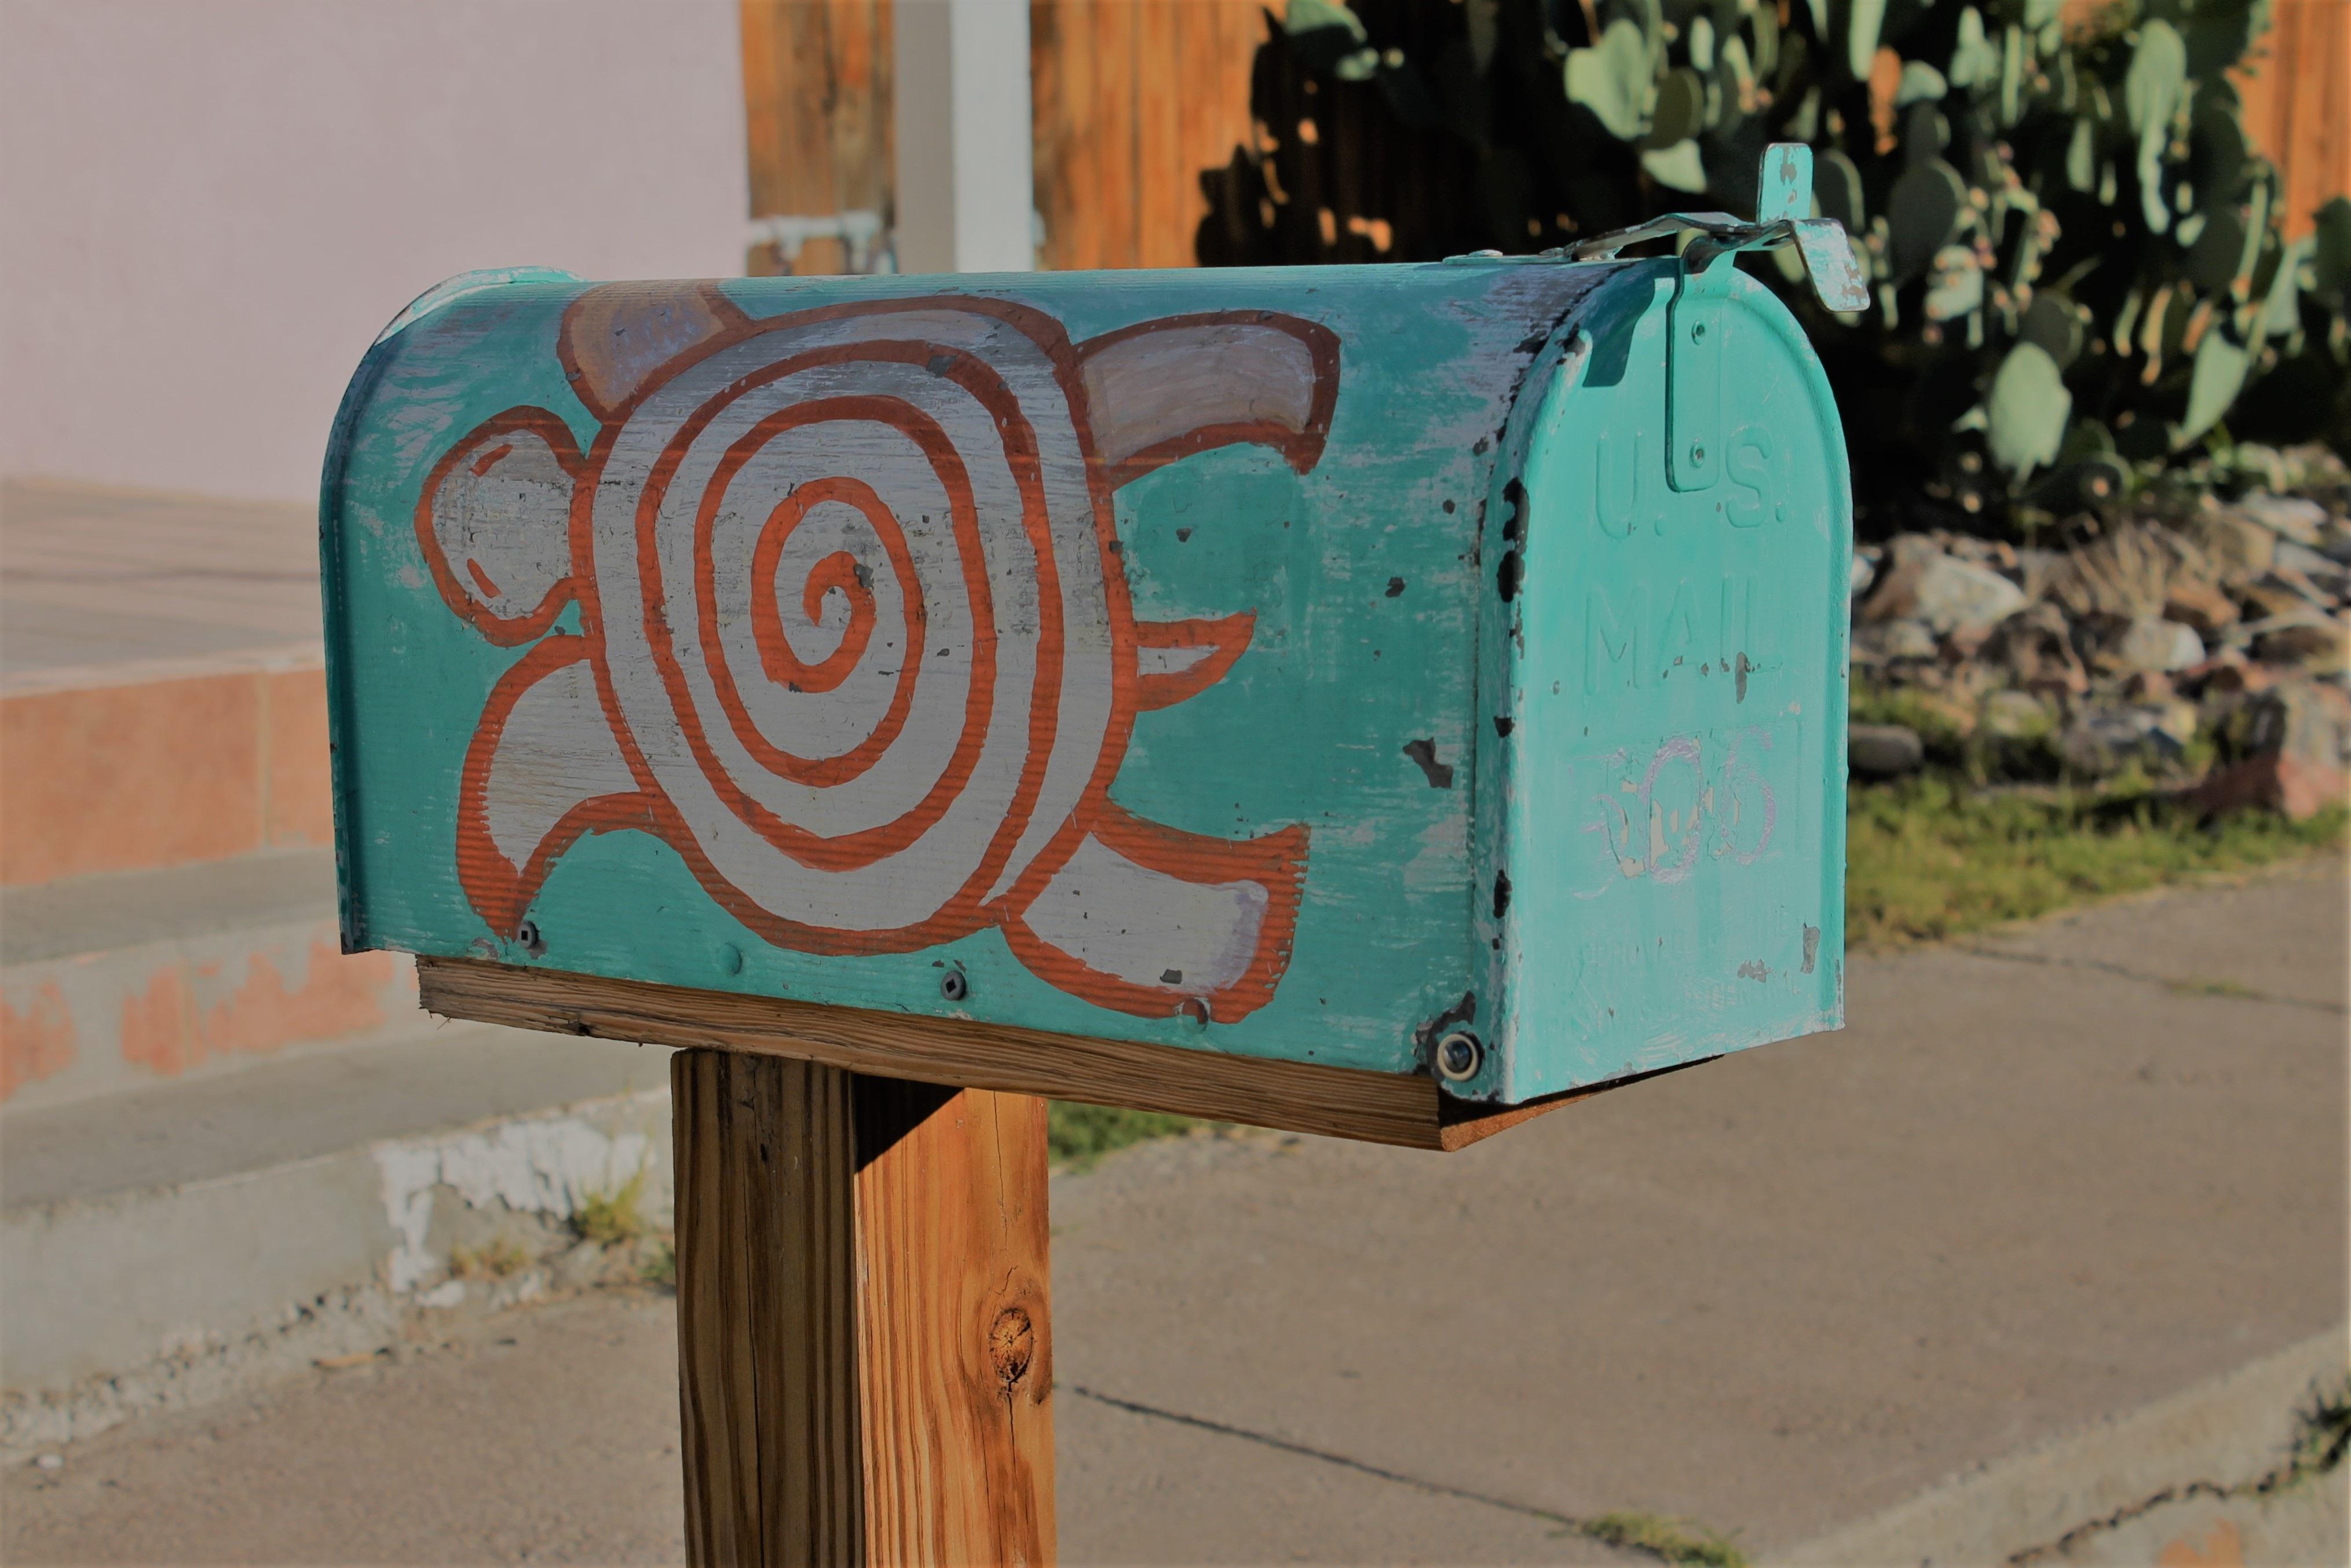 Free Images : cactus, post, wood, white, retro, spiral